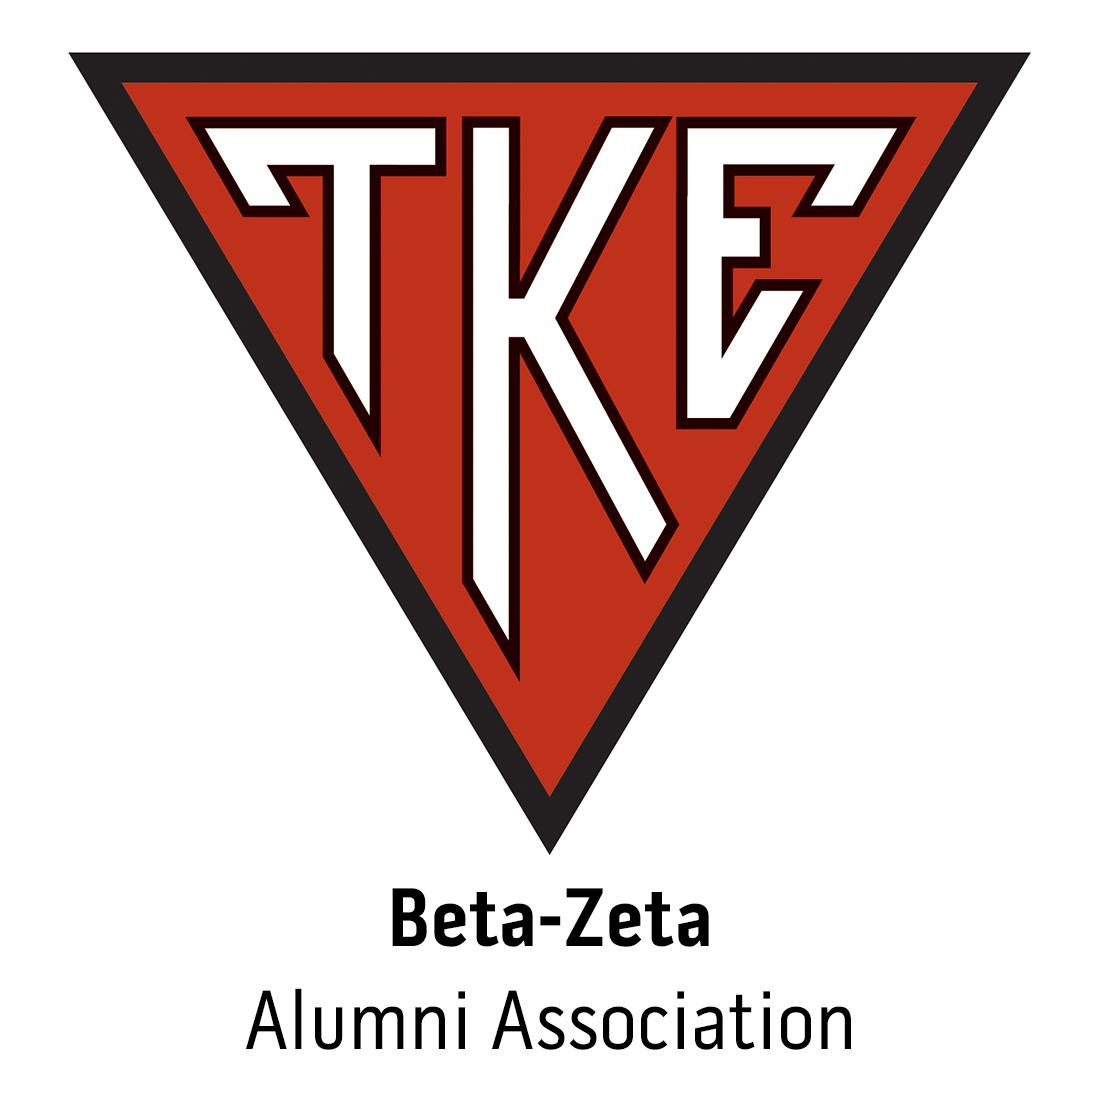 Beta-Zeta Alumni Association at Louisiana Tech University